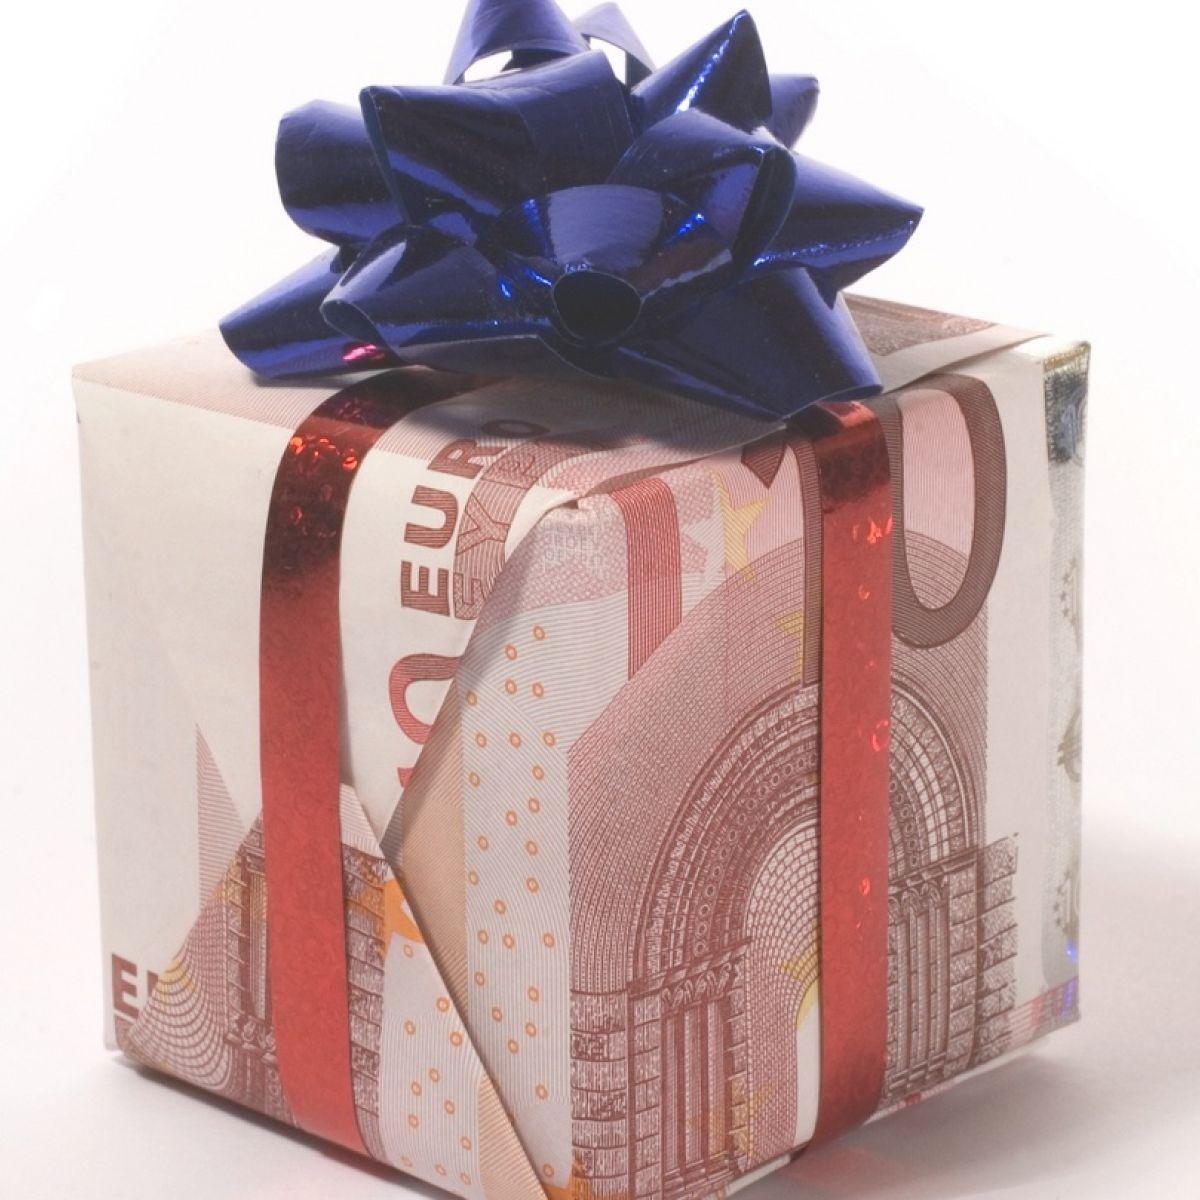 The Christmas bonus: how I\'ll spend it